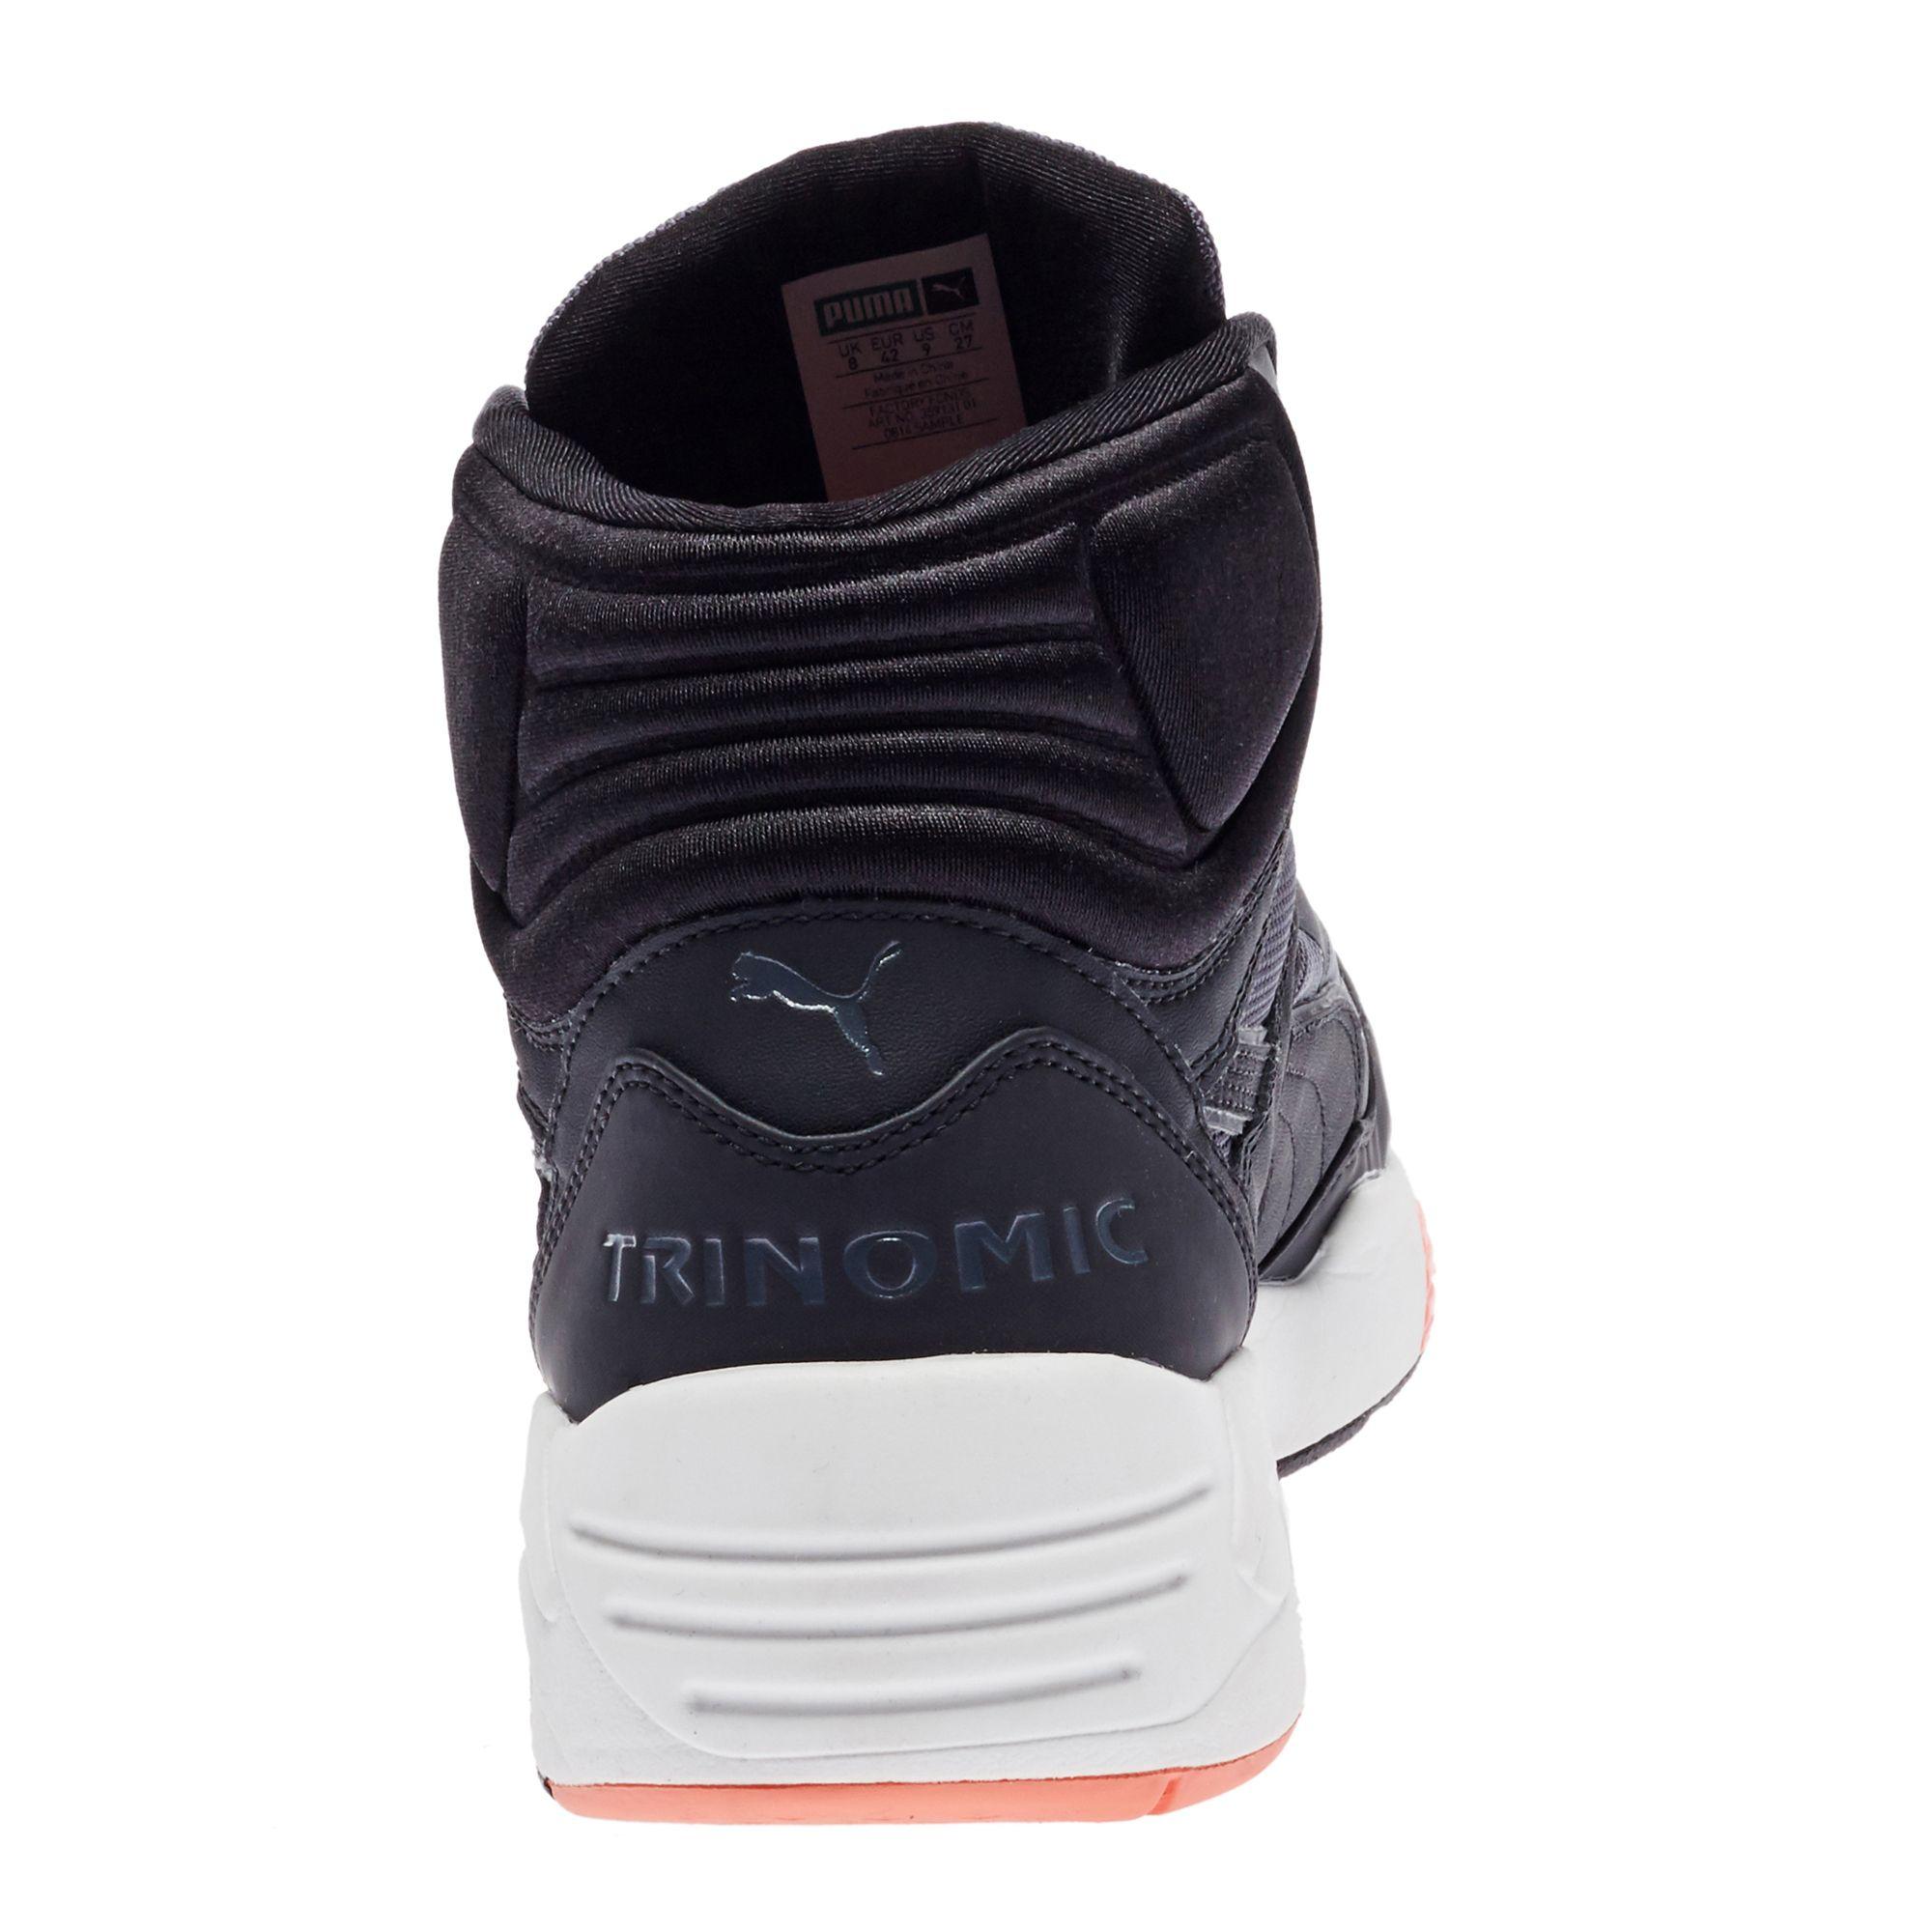 chaussure montante puma